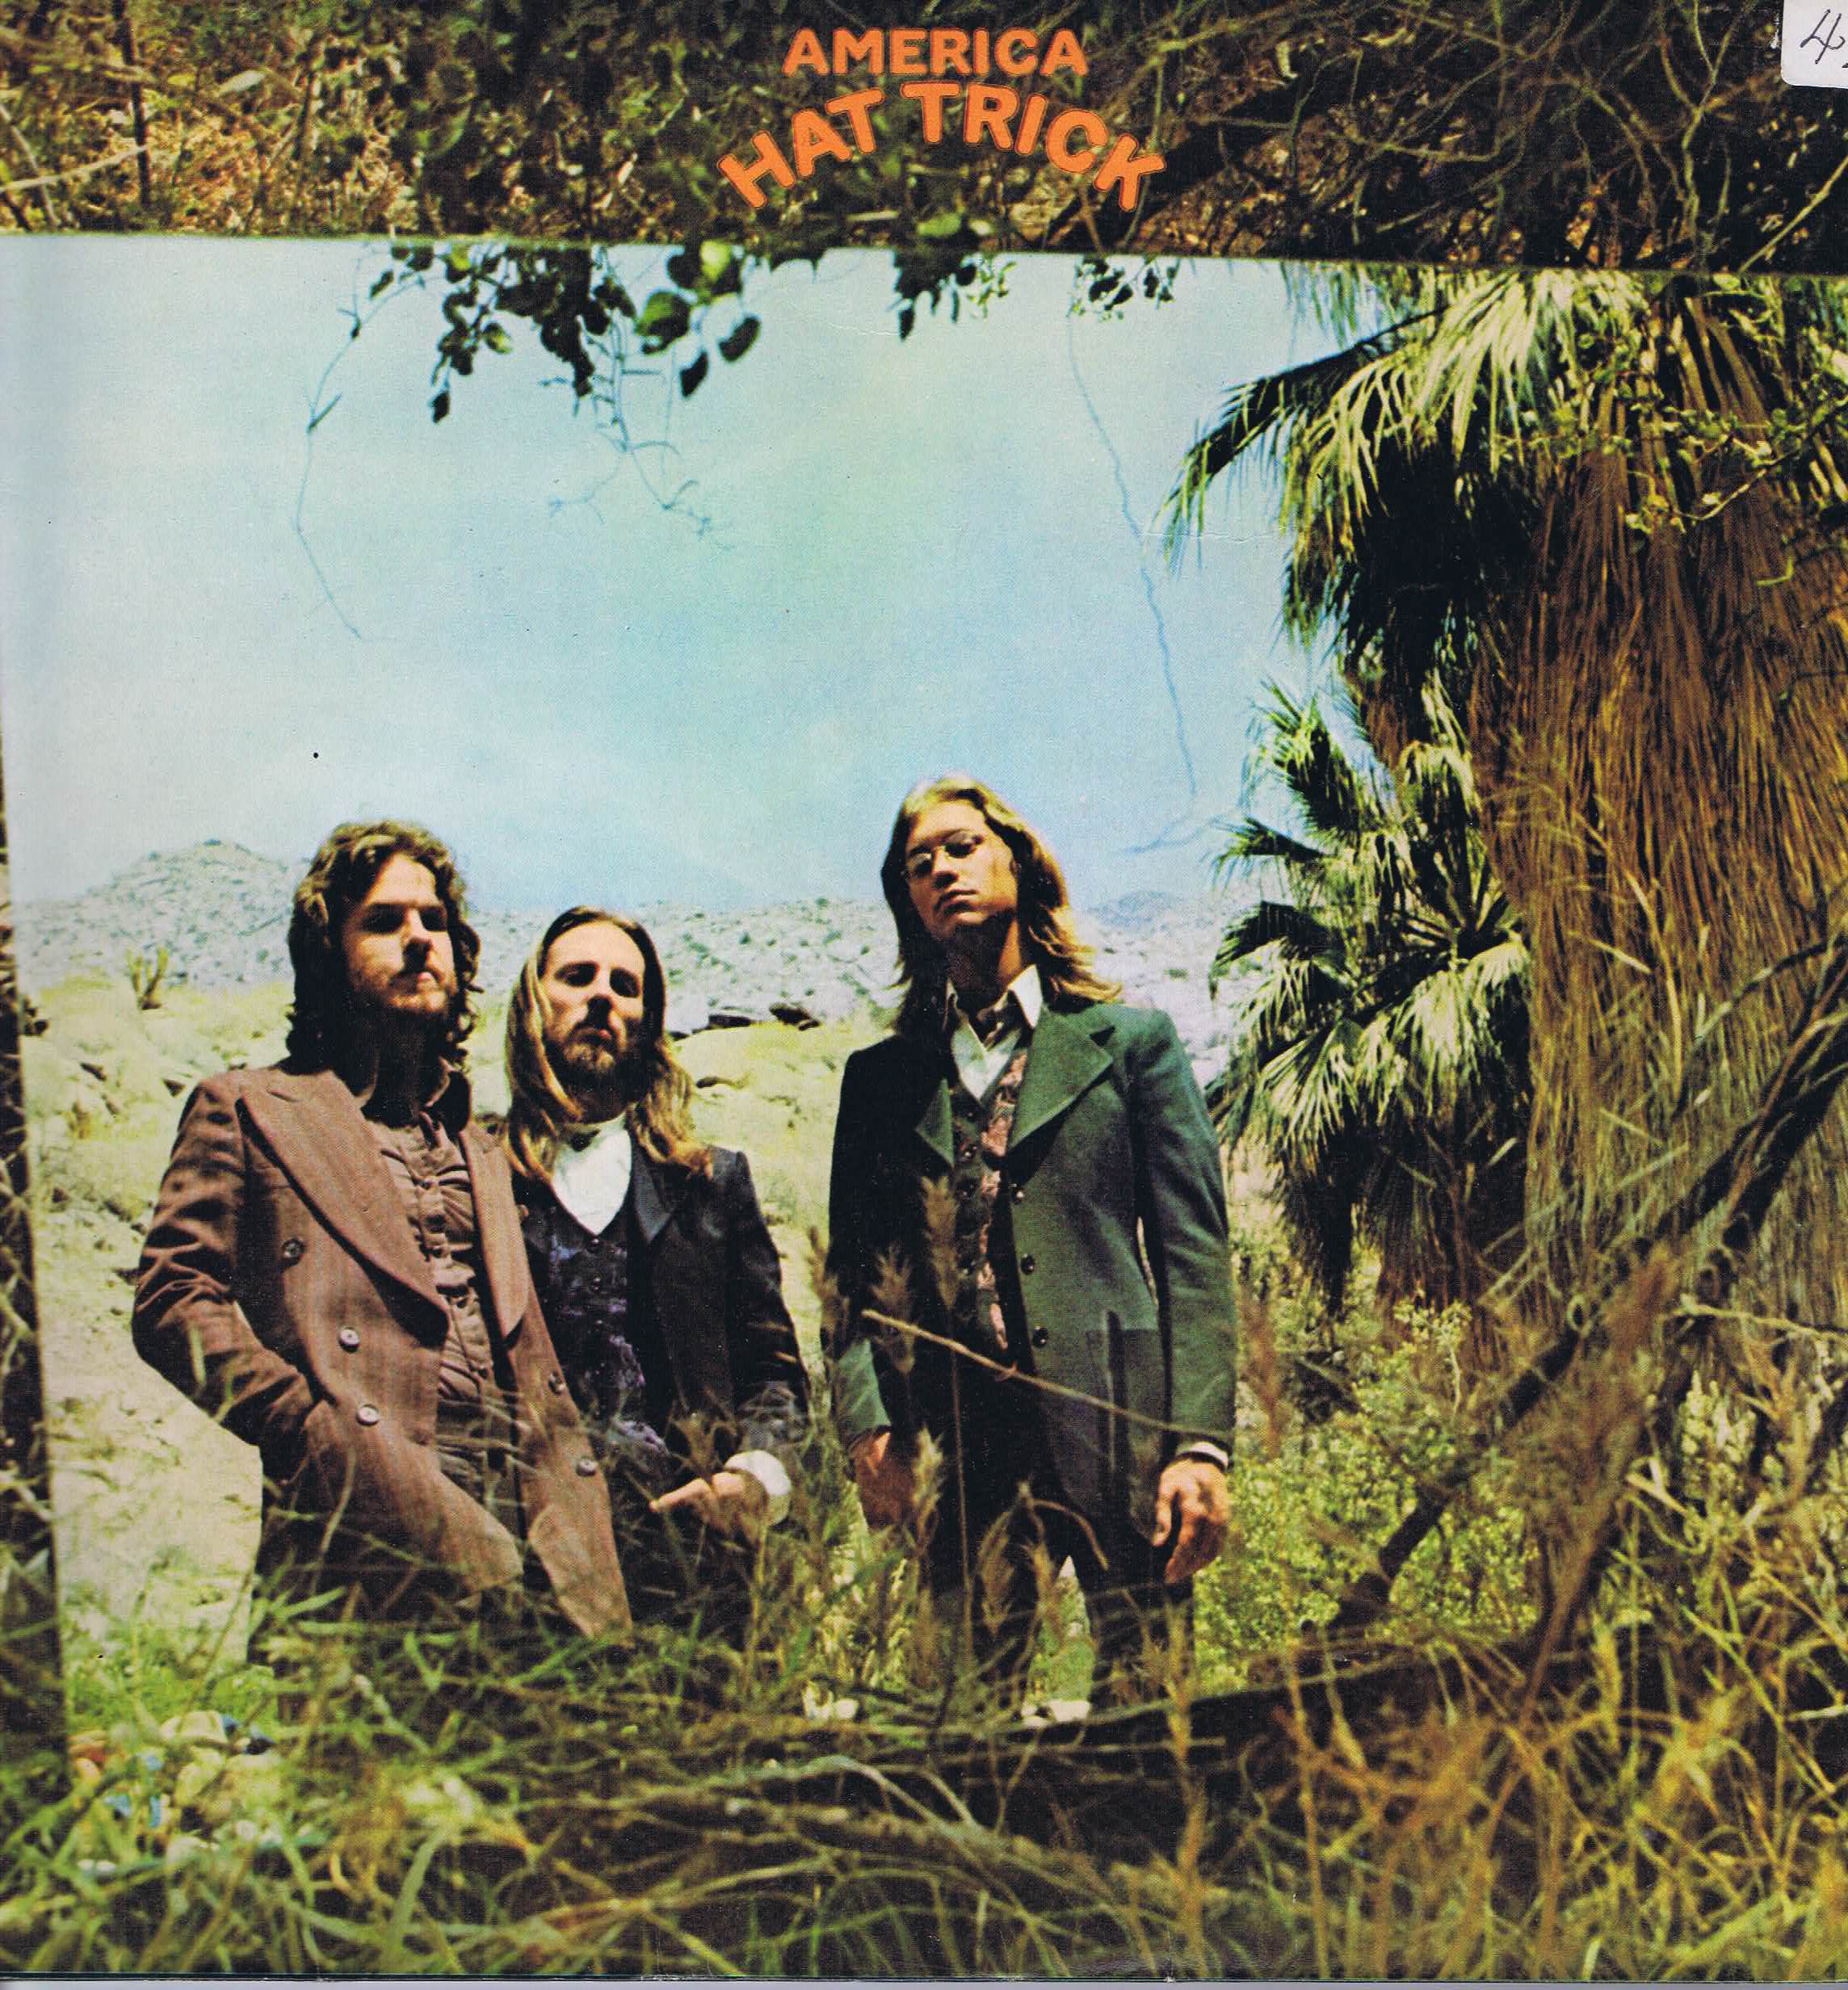 America Hat Trick K 56016 Lp Vinyl Record Wax